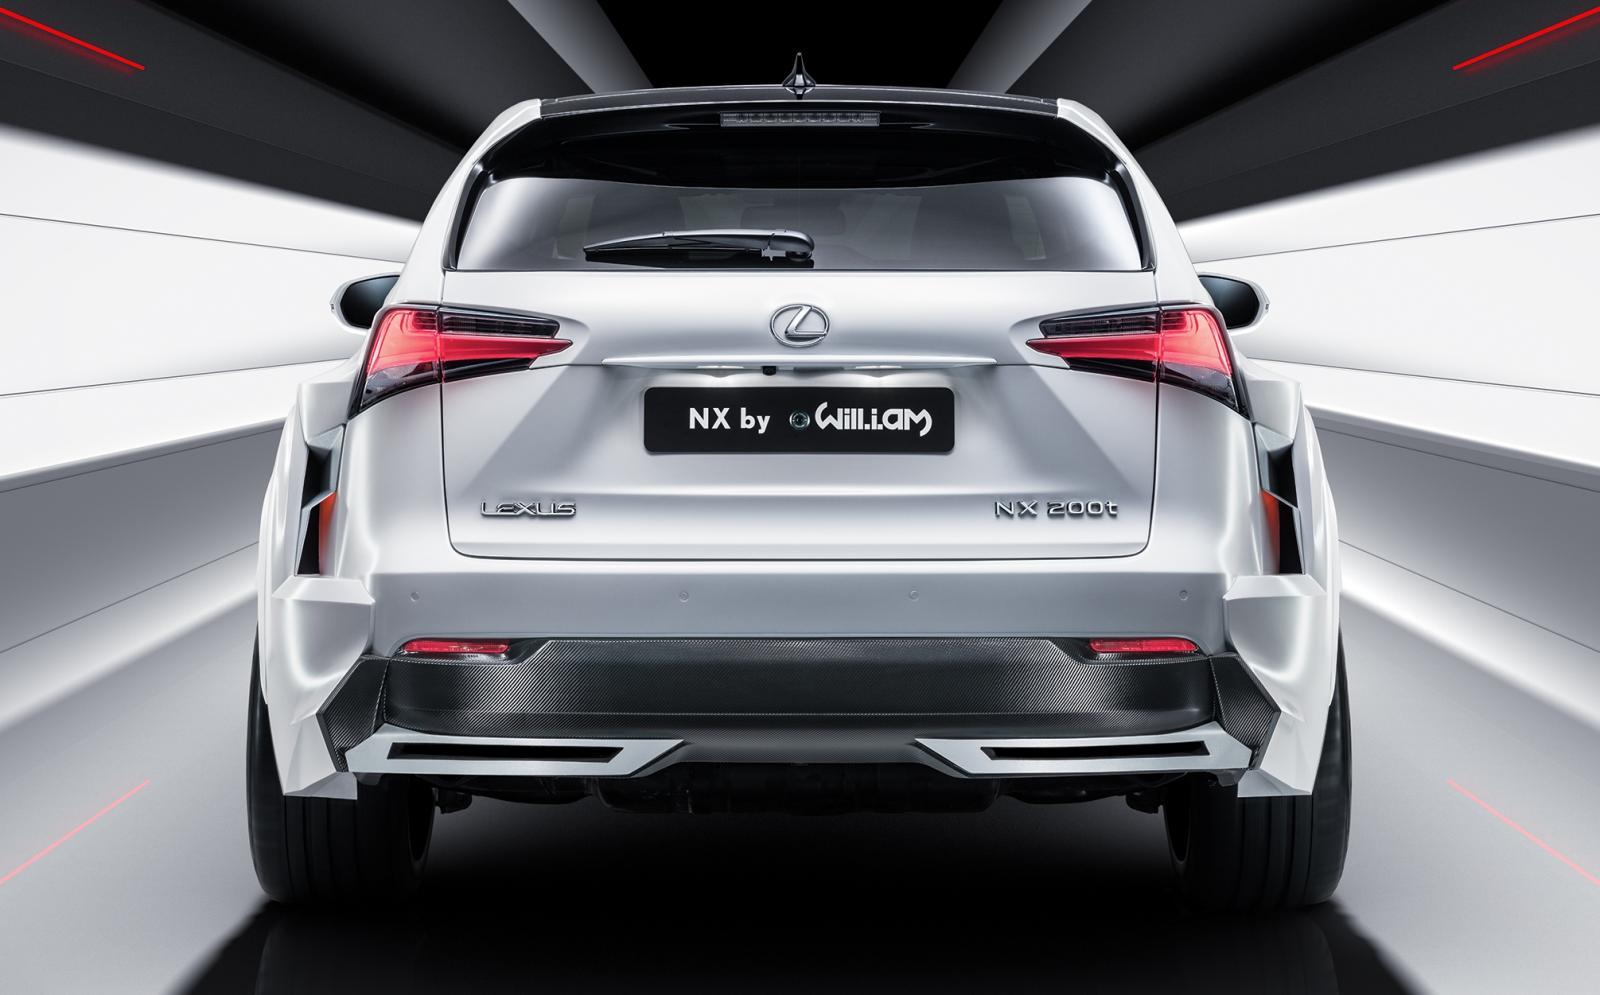 http://www.car-revs-daily.com/wp-content/uploads/2014/10/2016-Lexus-NX-F-Concept-11-1600x995.jpg